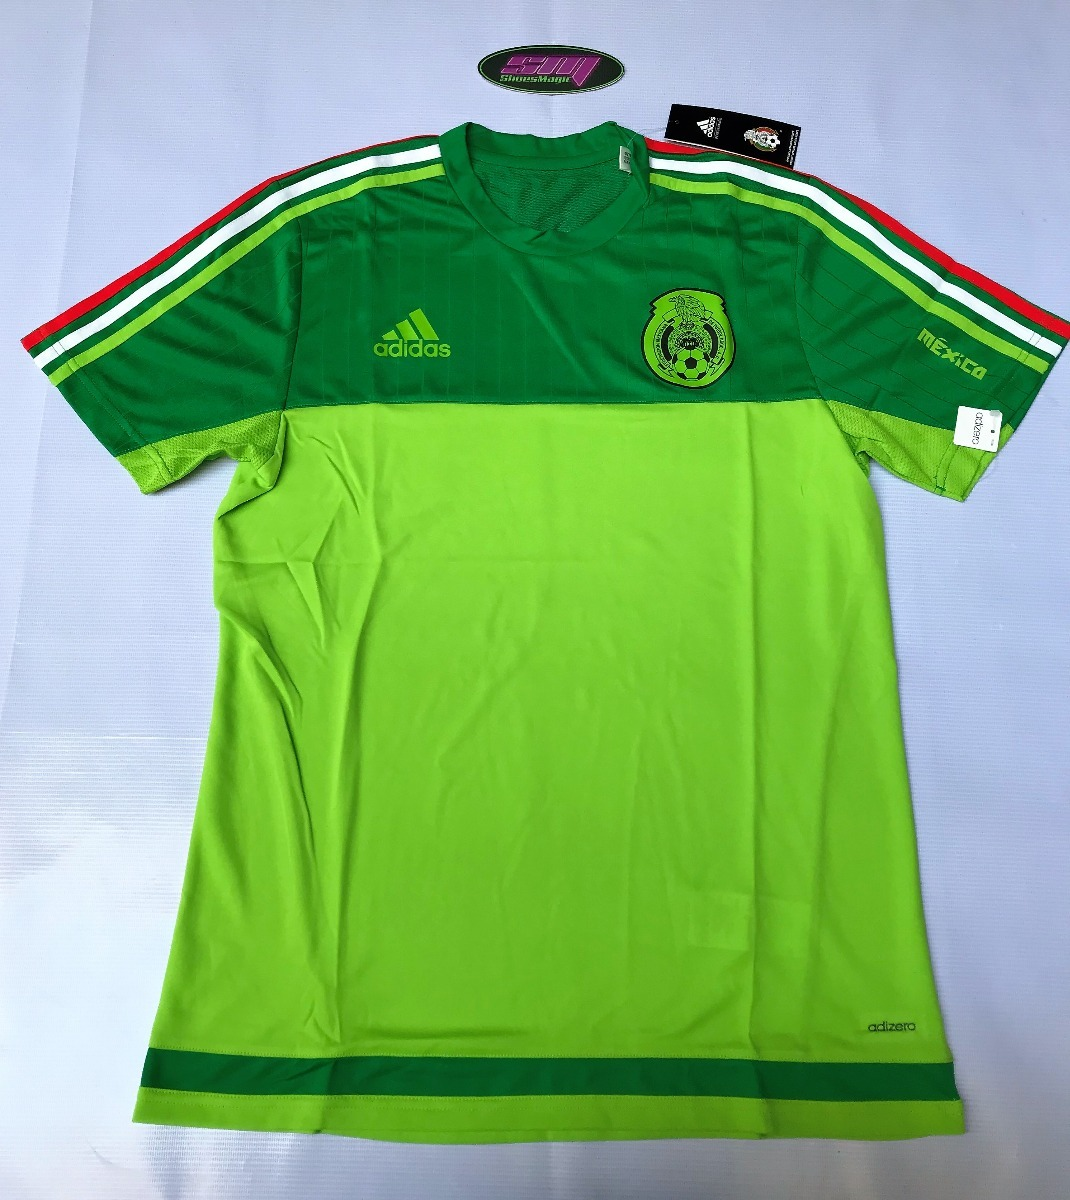 Playera adidas De Mexico Entrenamiento -   449.00 en Mercado Libre 1cc7328041600